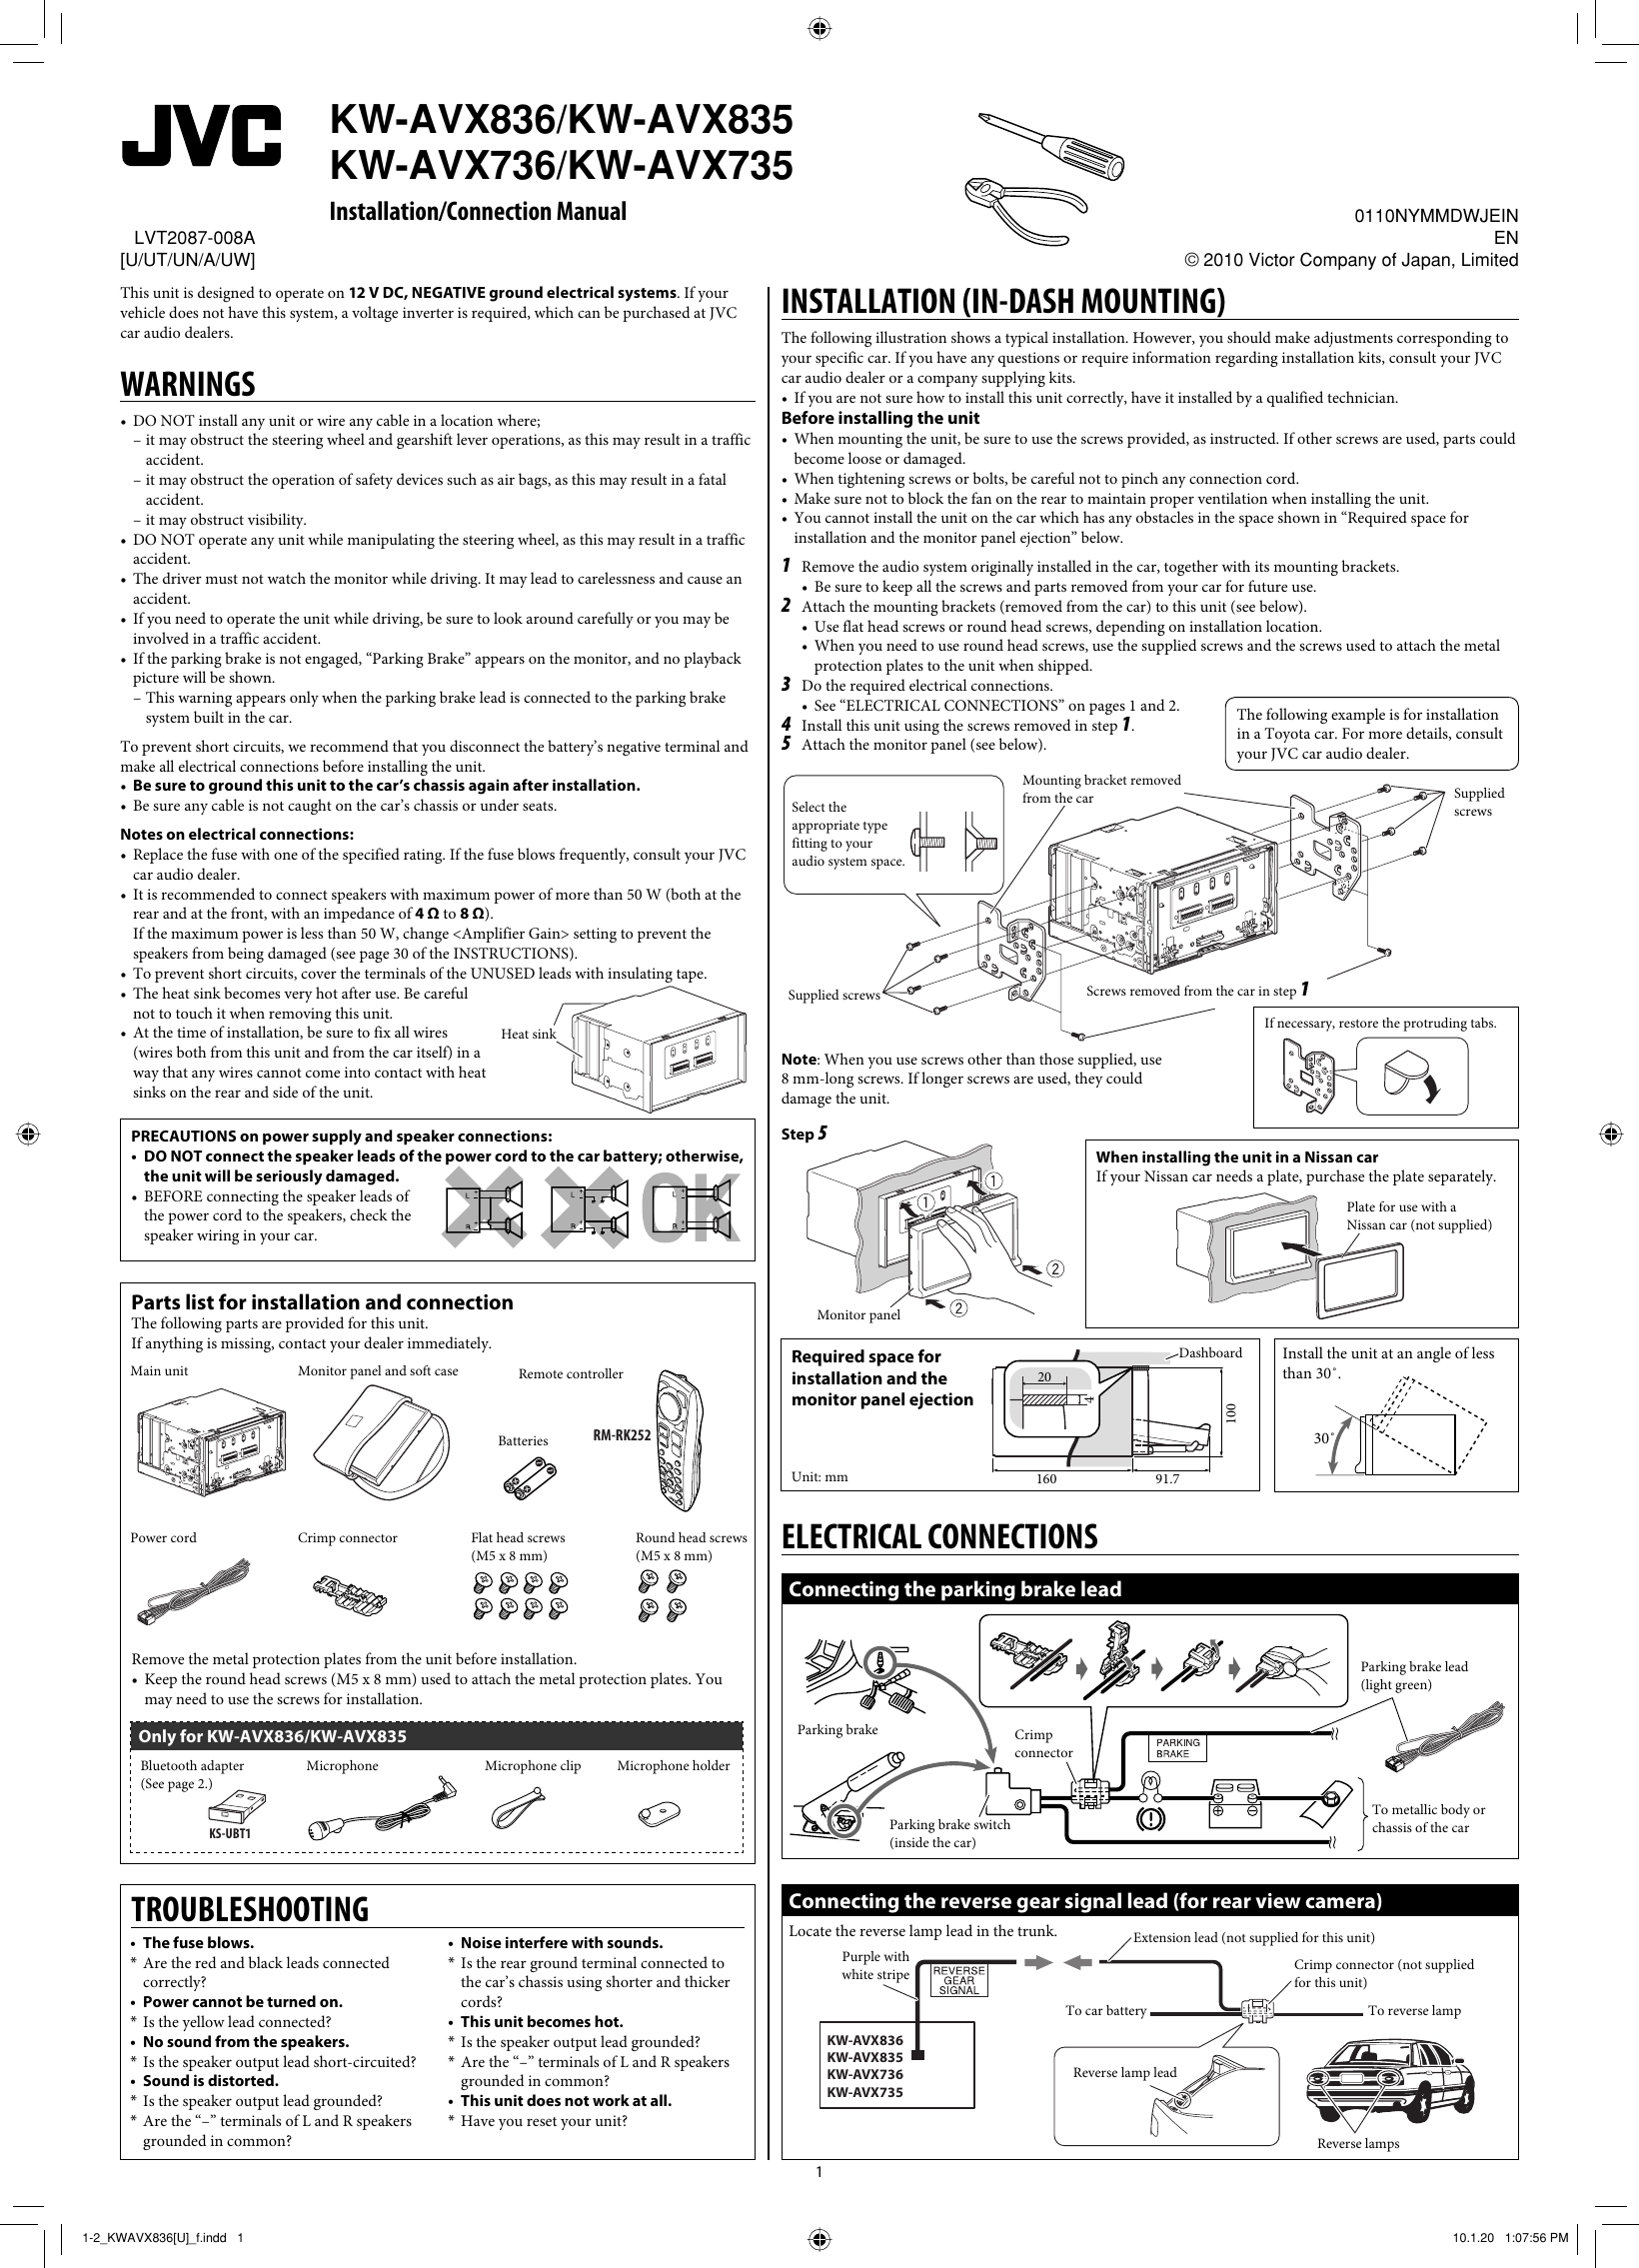 Jvc Kd G340 Wiring Diagram also Saab 9 5 Wiring Harness additionally Babyhawk Wiring Diagram in addition Weldex Wiring Diagram likewise Jvc Kd S26 Wiring Diagram. on jvc kd s29 wiring